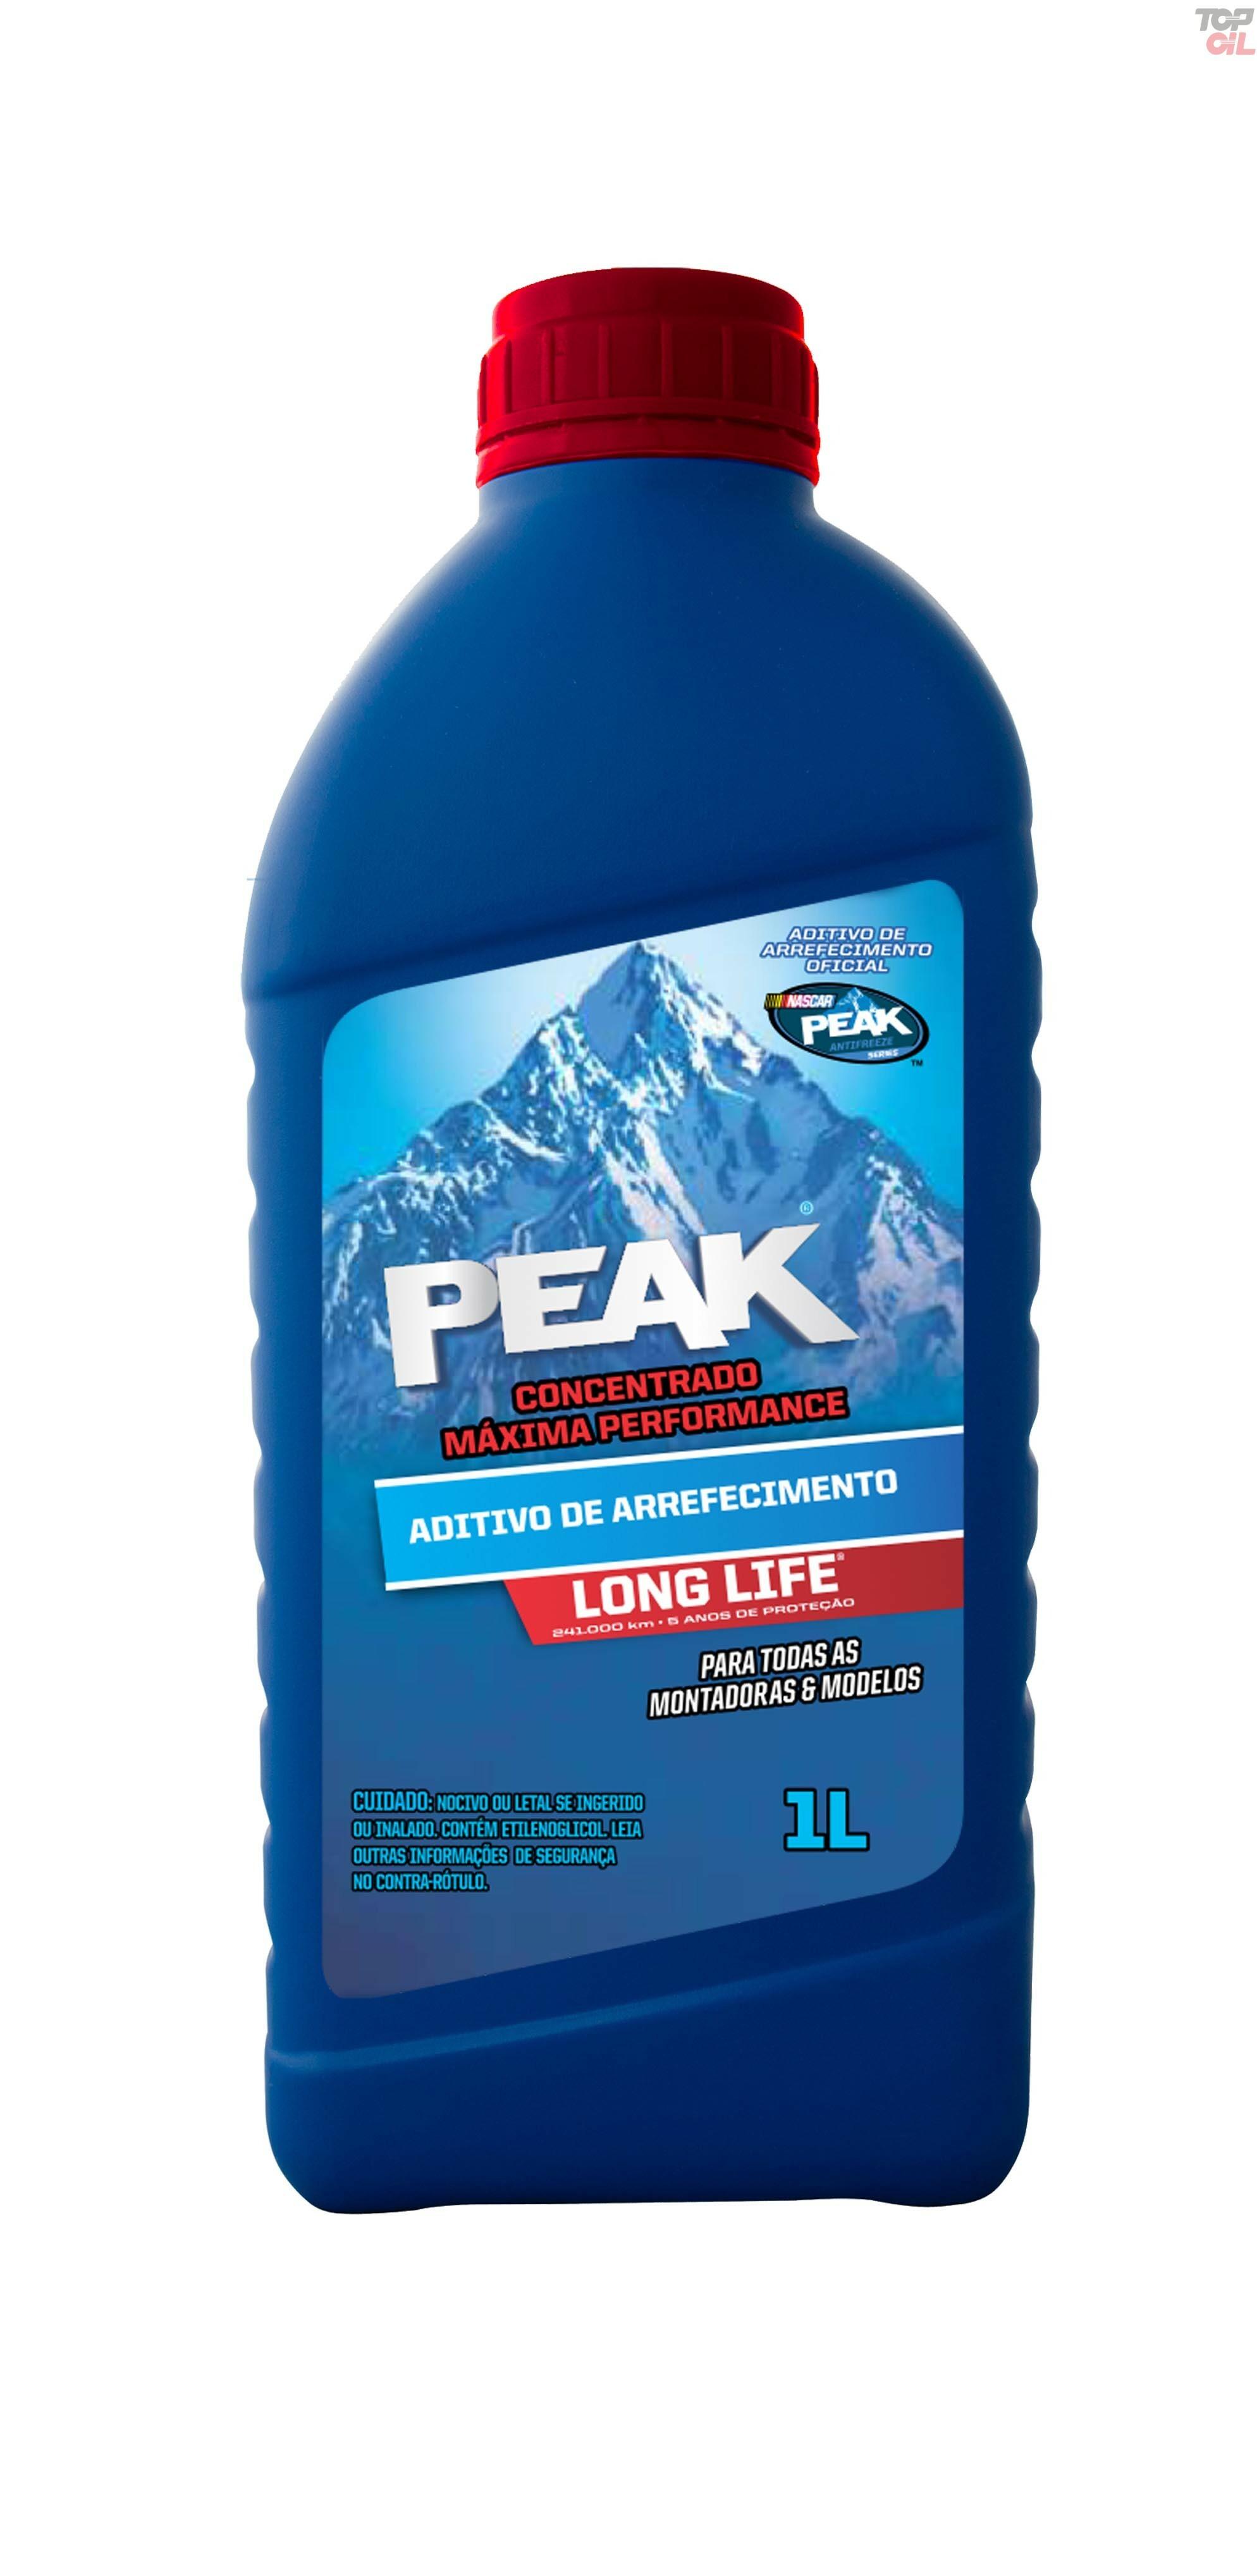 Aditivo Peak de arrefecimento ORGANICO LONG LIFE (CONCENTRADO) - 1 litro